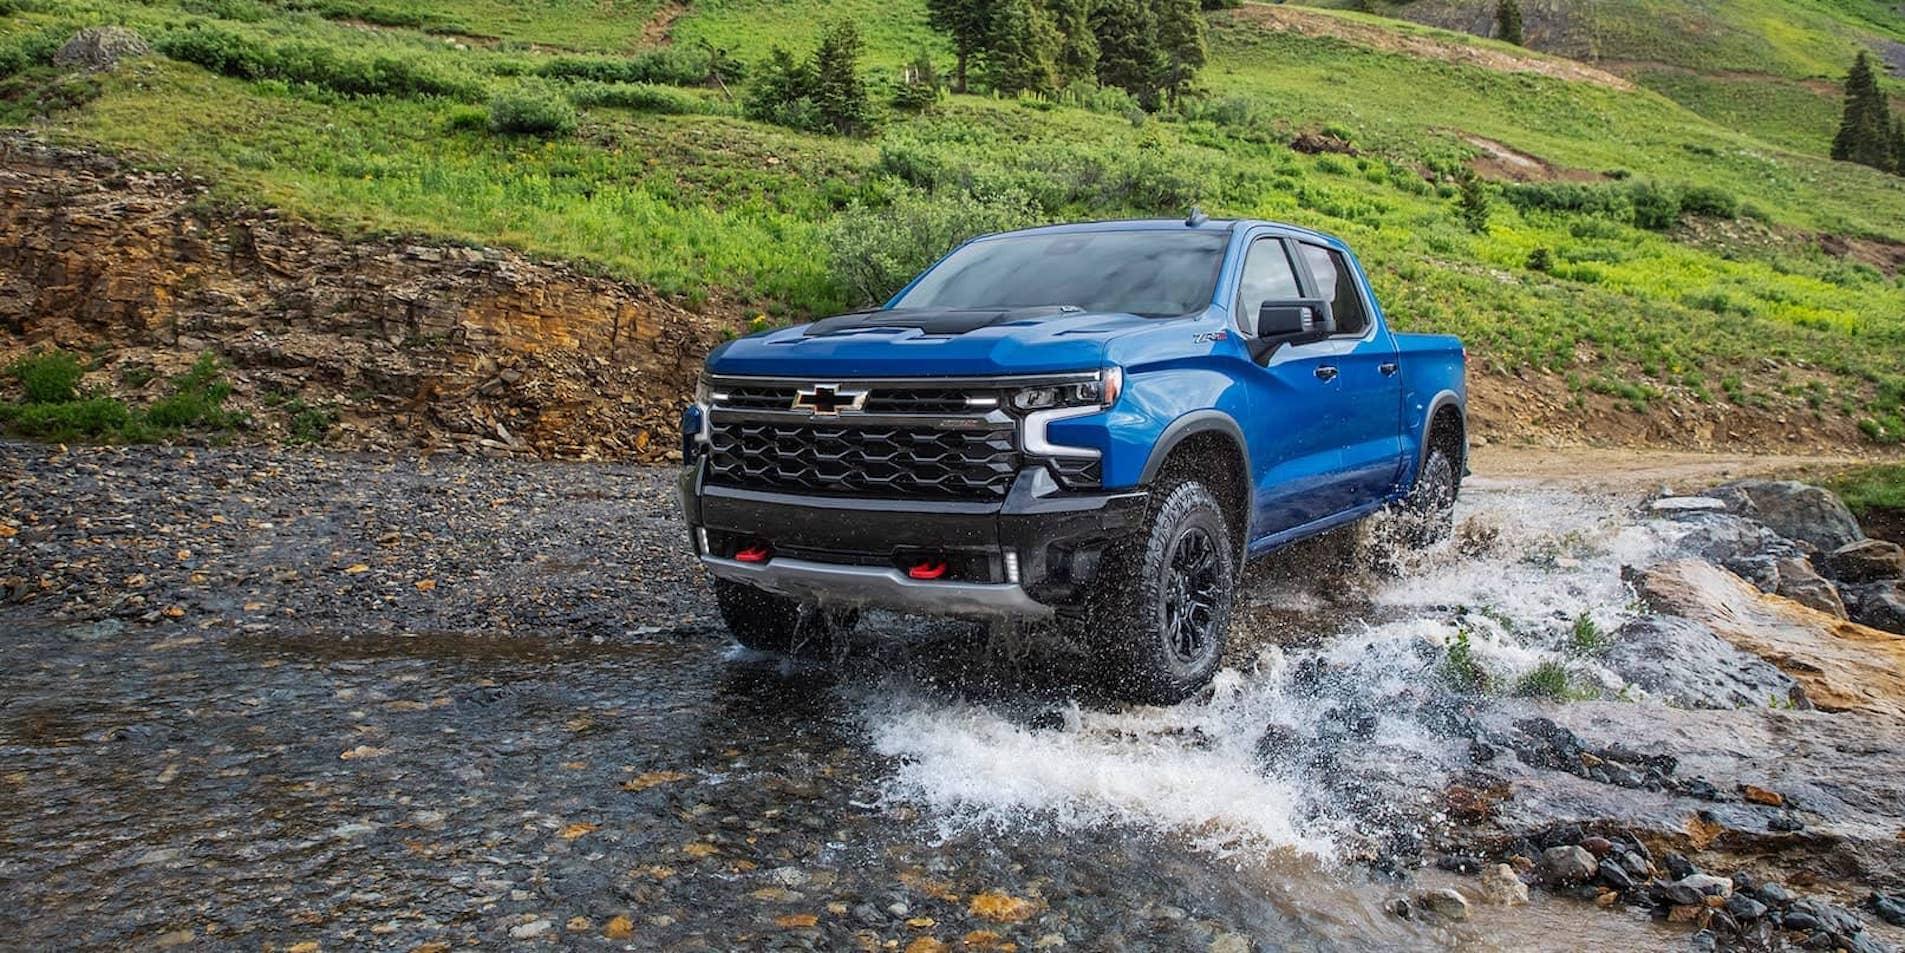 Blue Silverado Splashing Through Water on Road